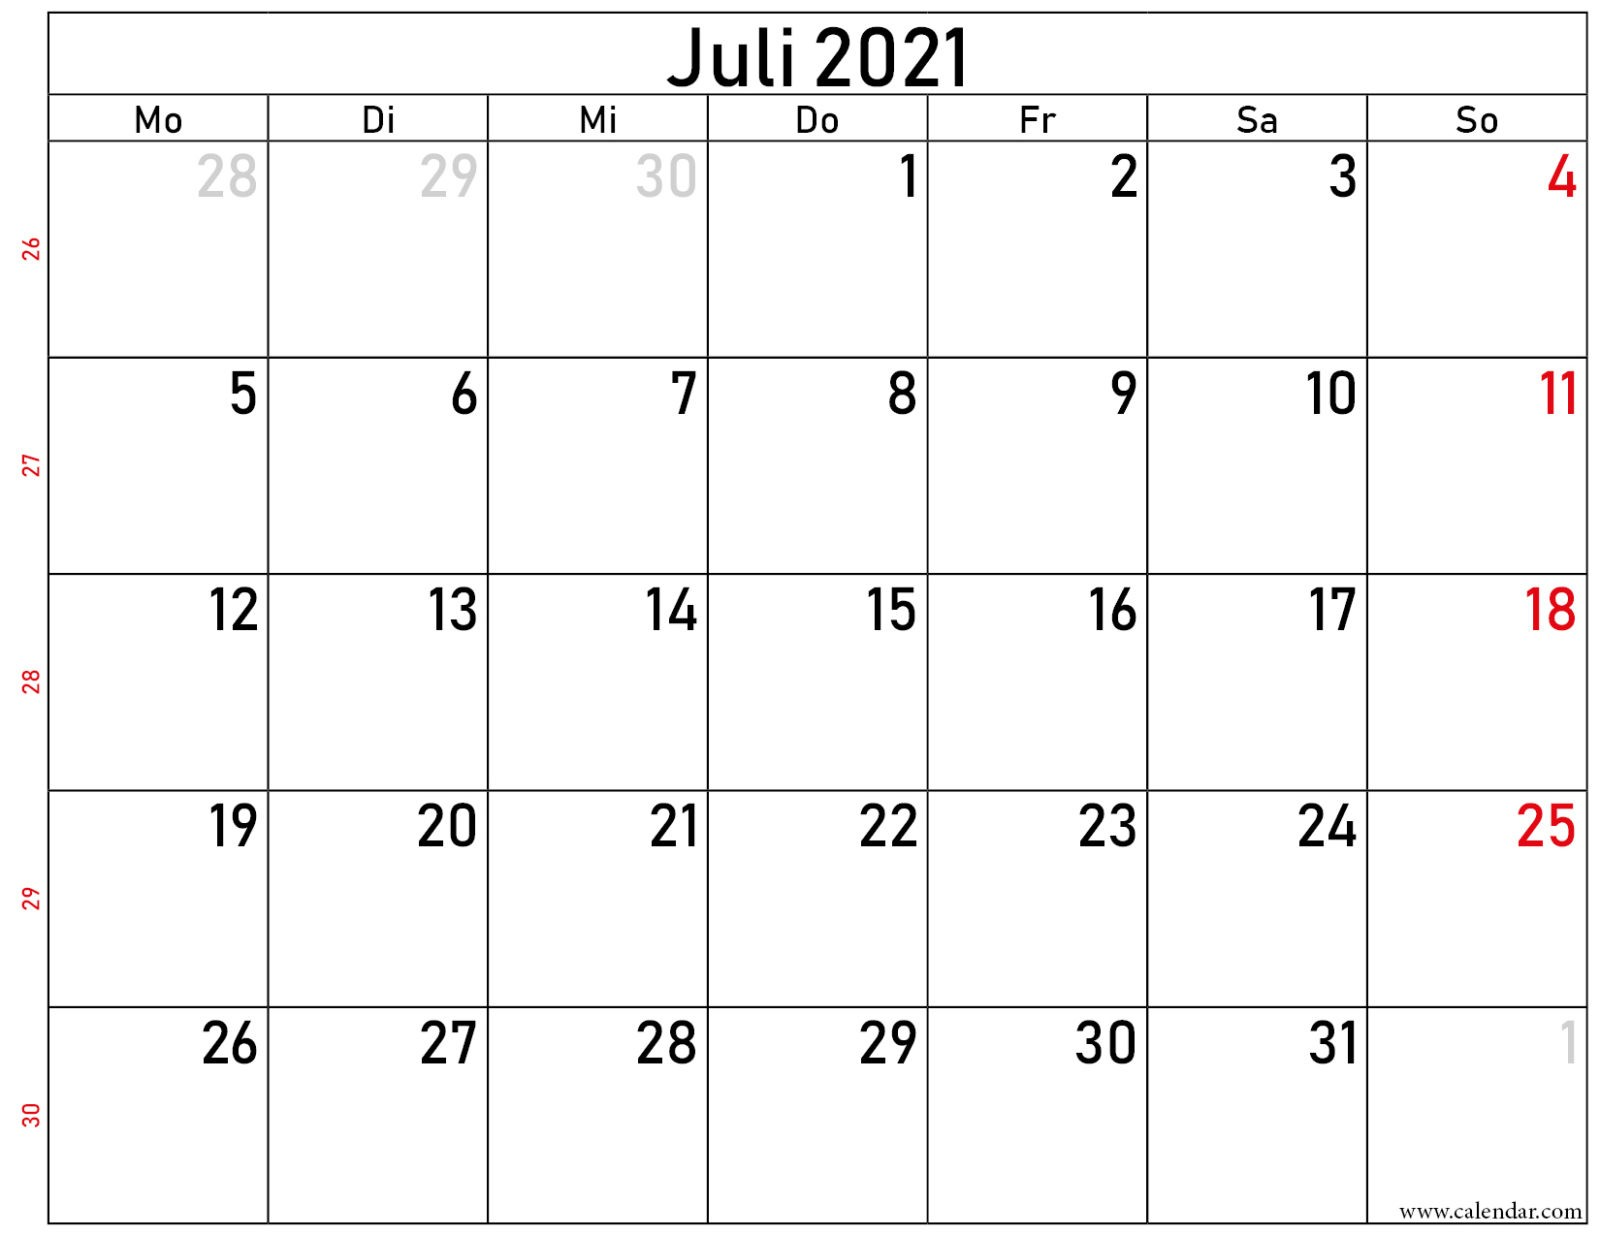 2021 juli kalender